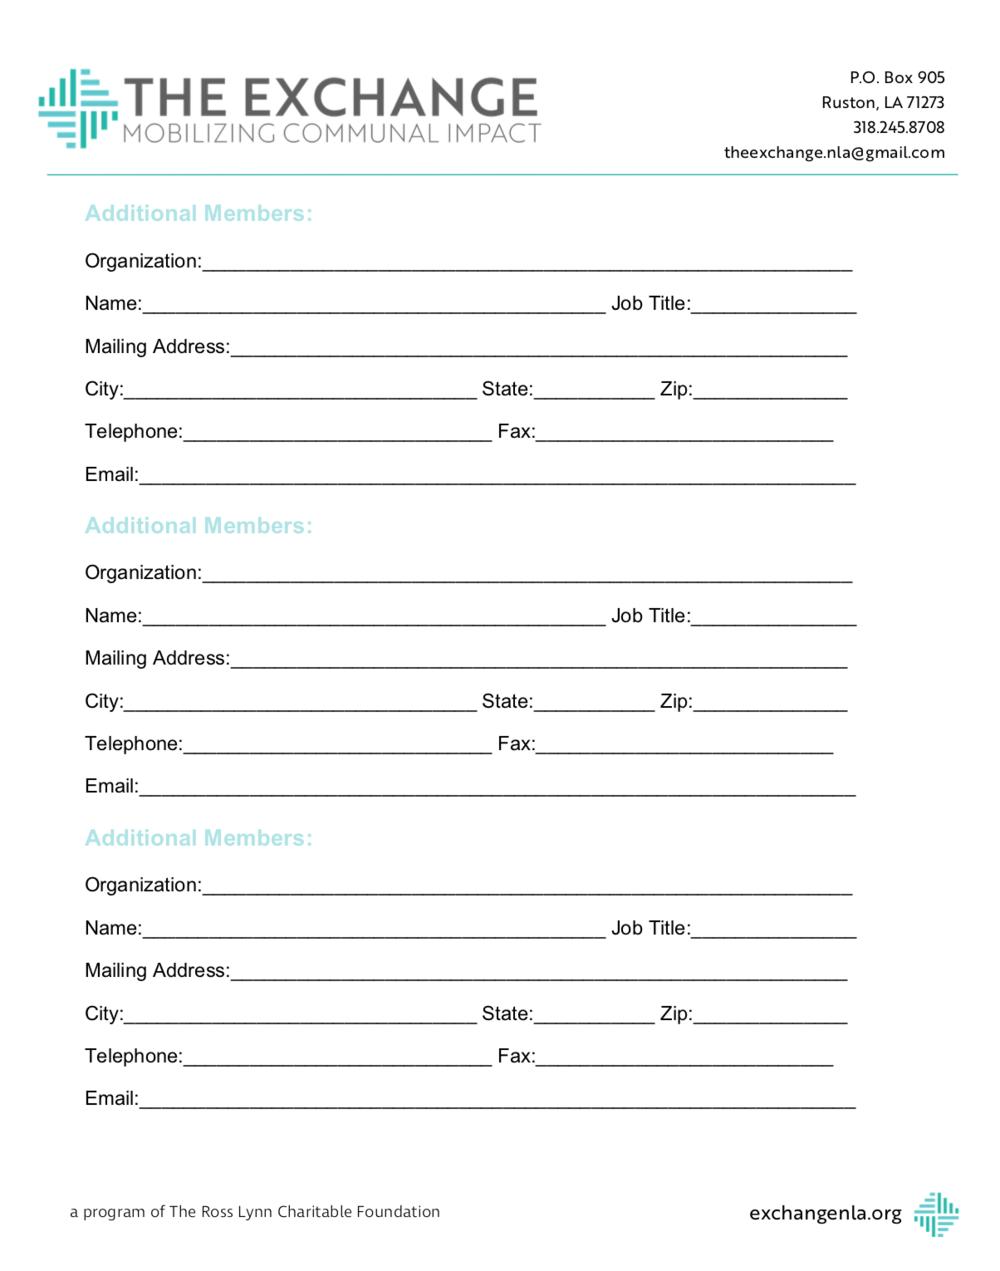 Additional member form